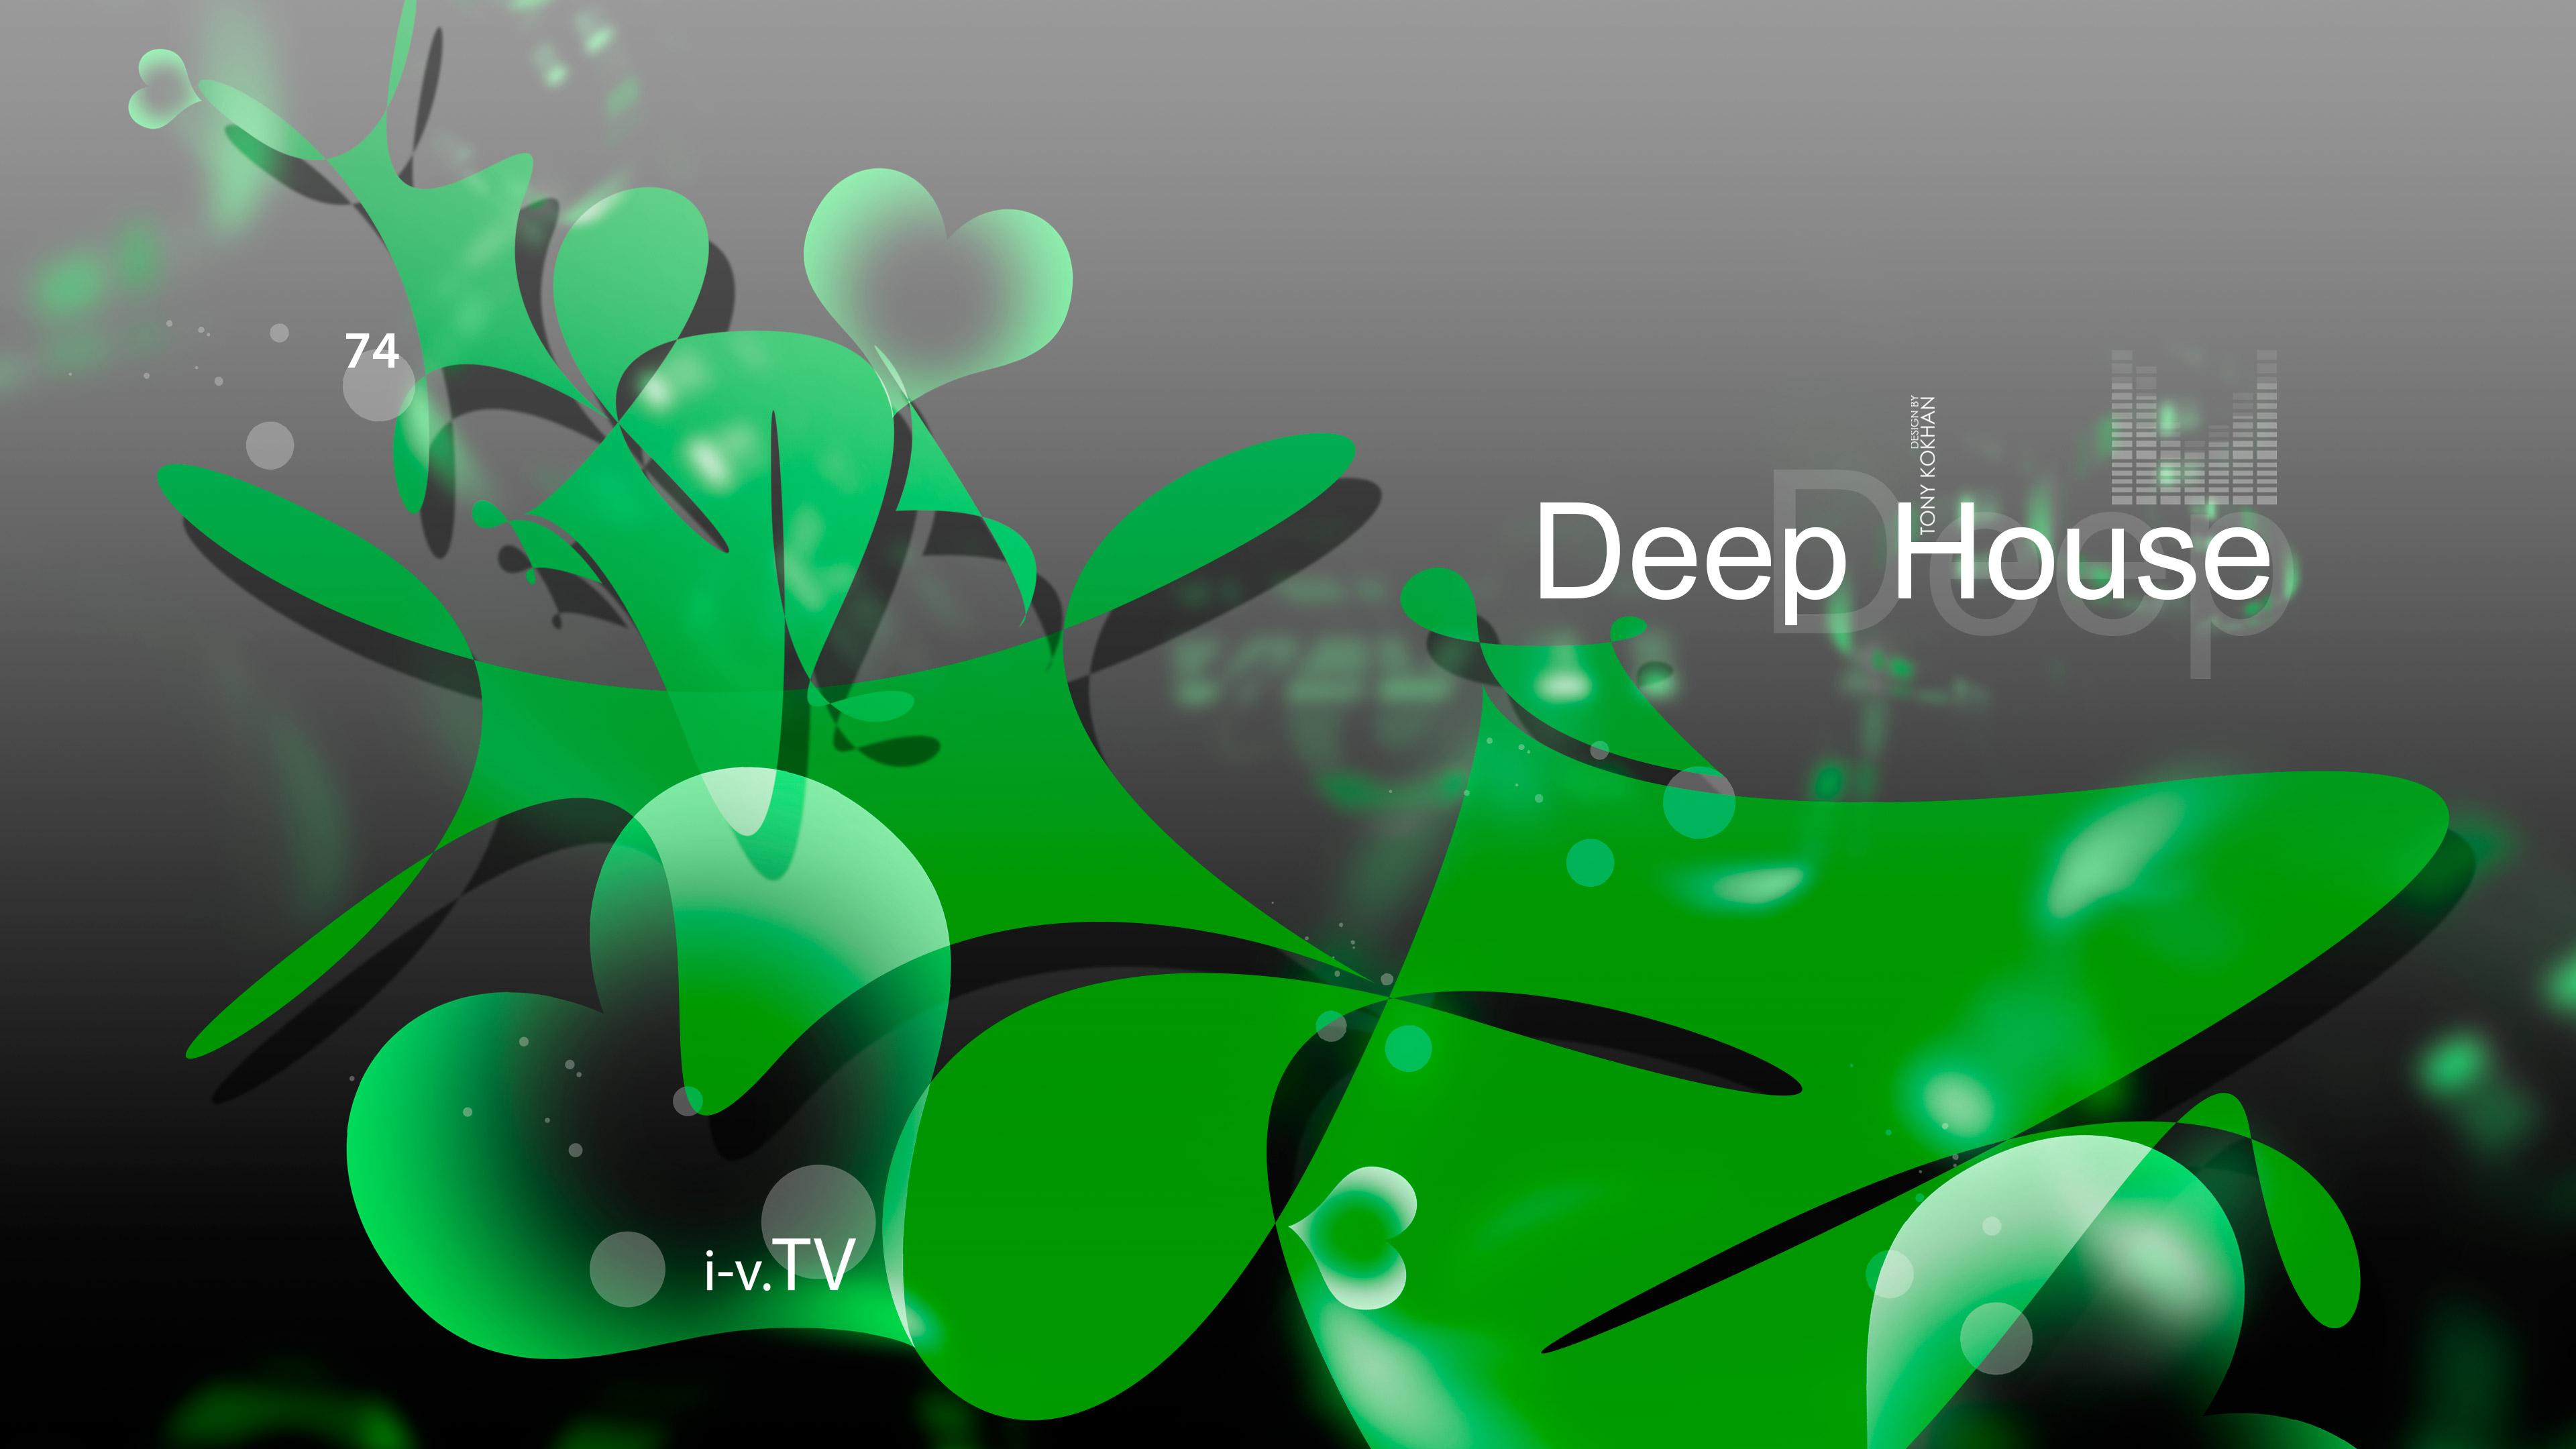 Deep House Music eQ SC Seventy Four 2016 Tony Kokhan Sound 3840x2160